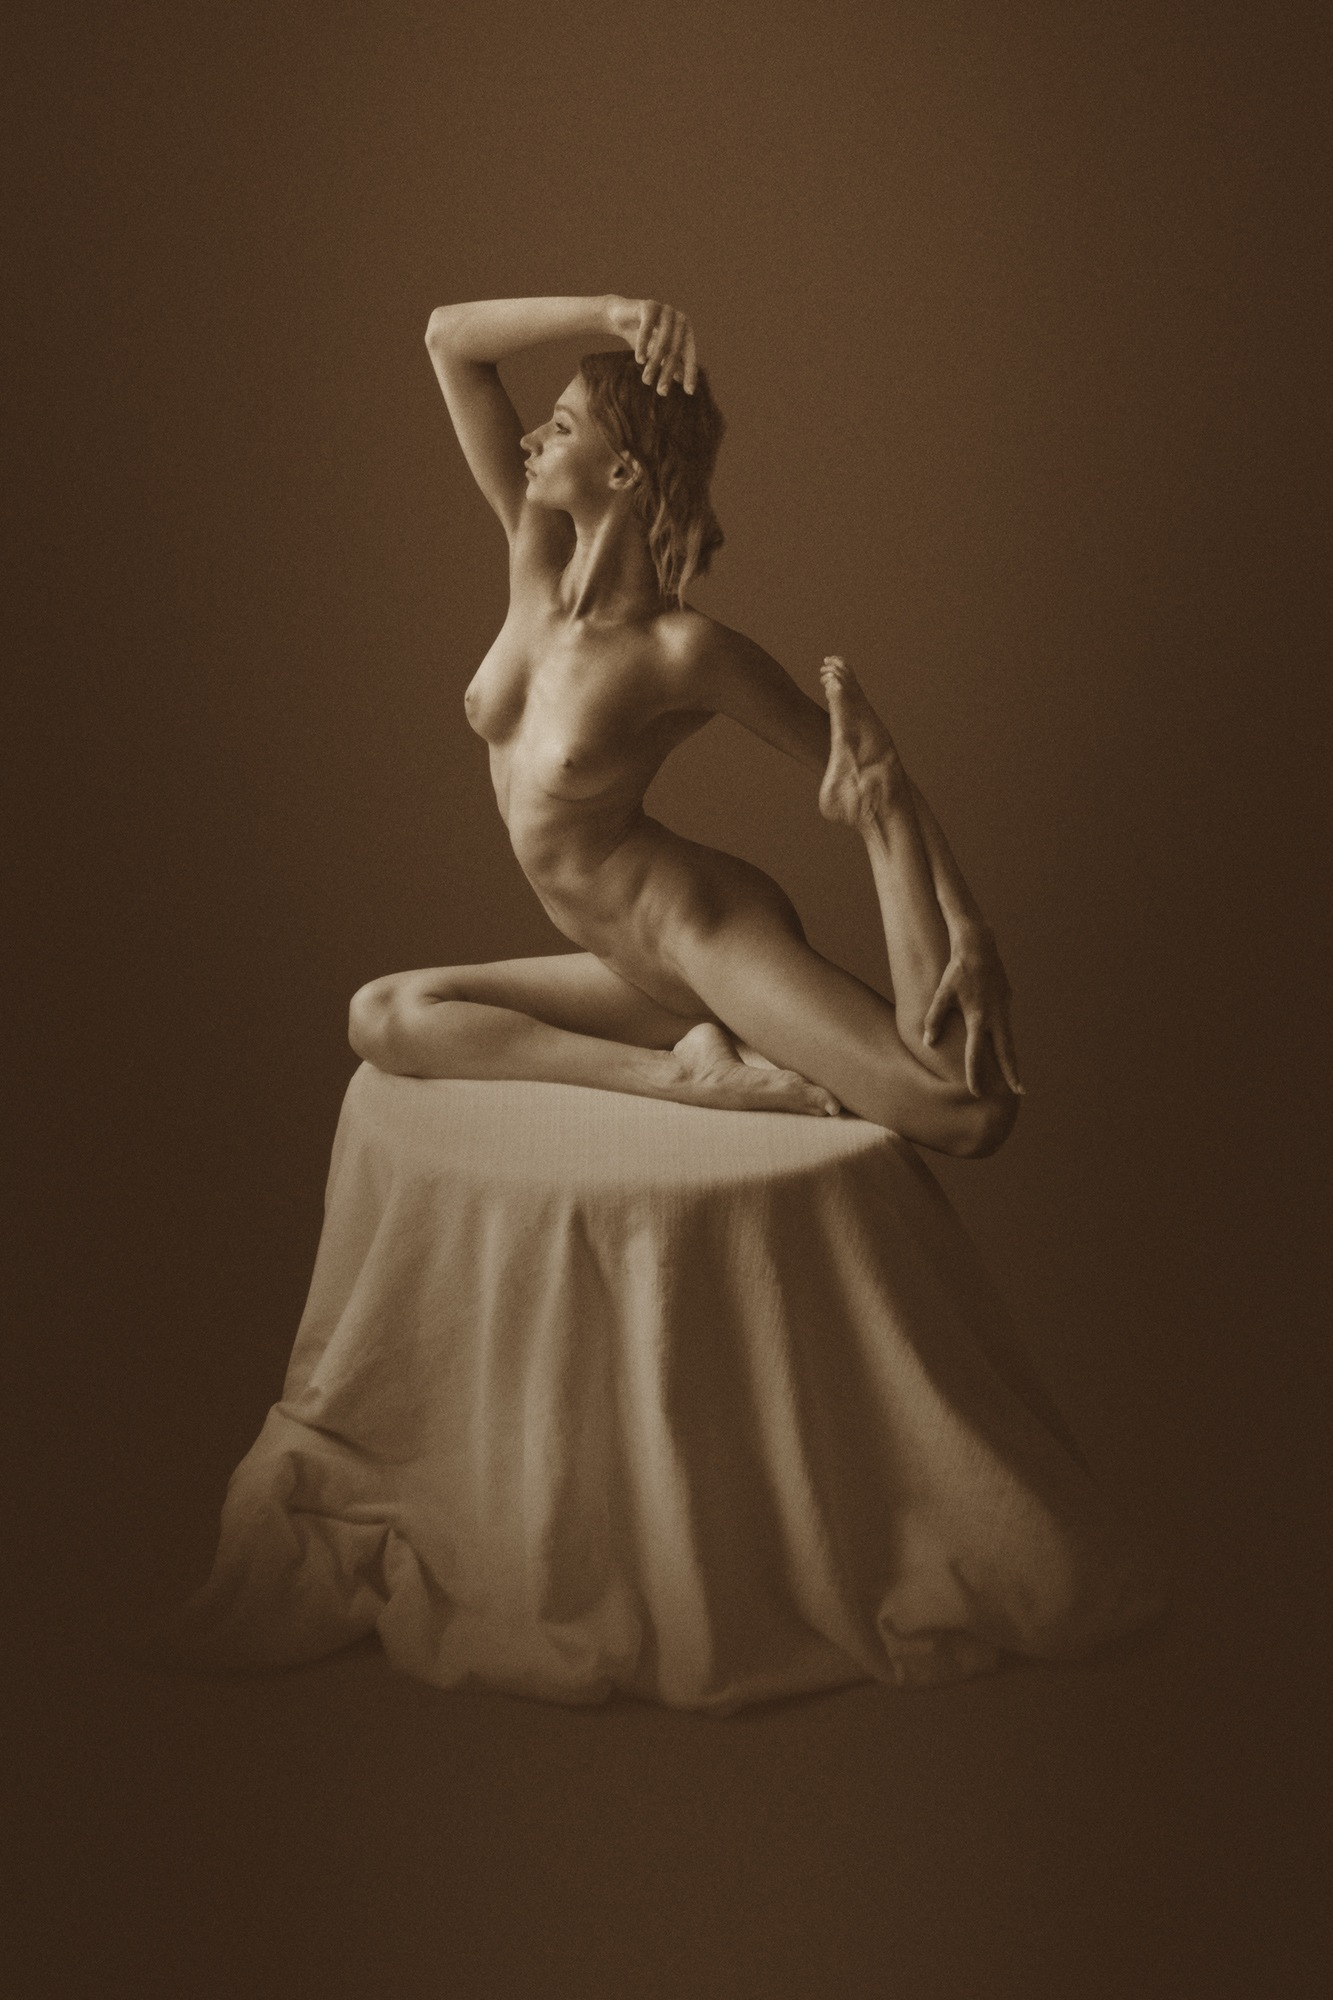 The women are wonderful - VI by Arnis Krumins